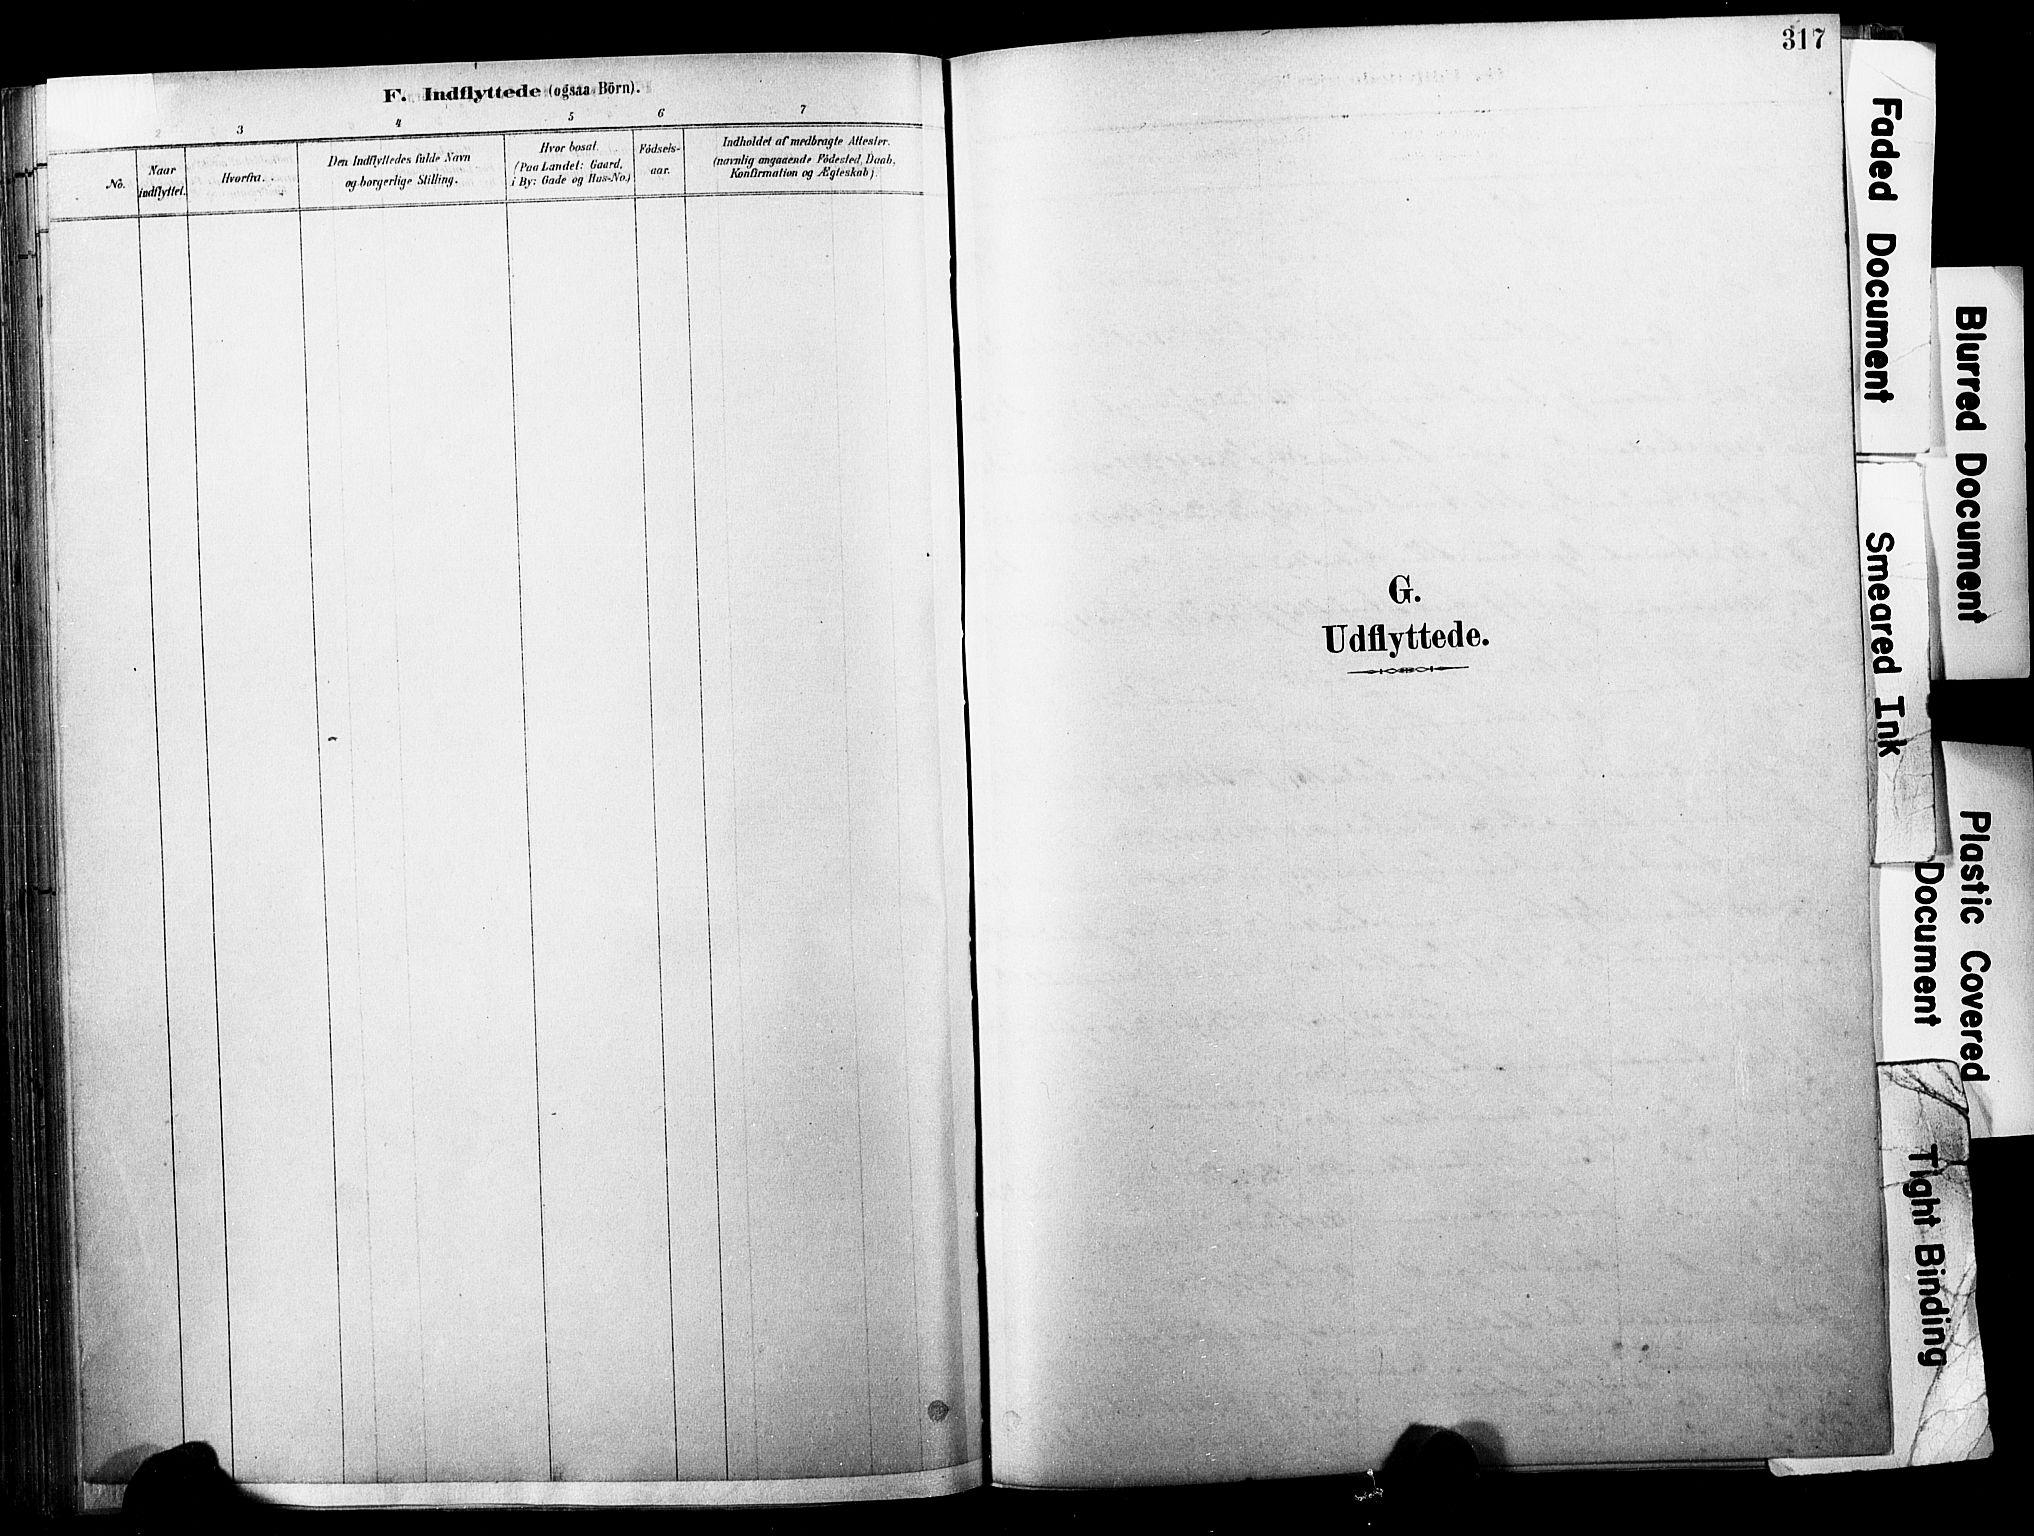 SAKO, Horten kirkebøker, F/Fa/L0004: Parish register (official) no. 4, 1888-1895, p. 317